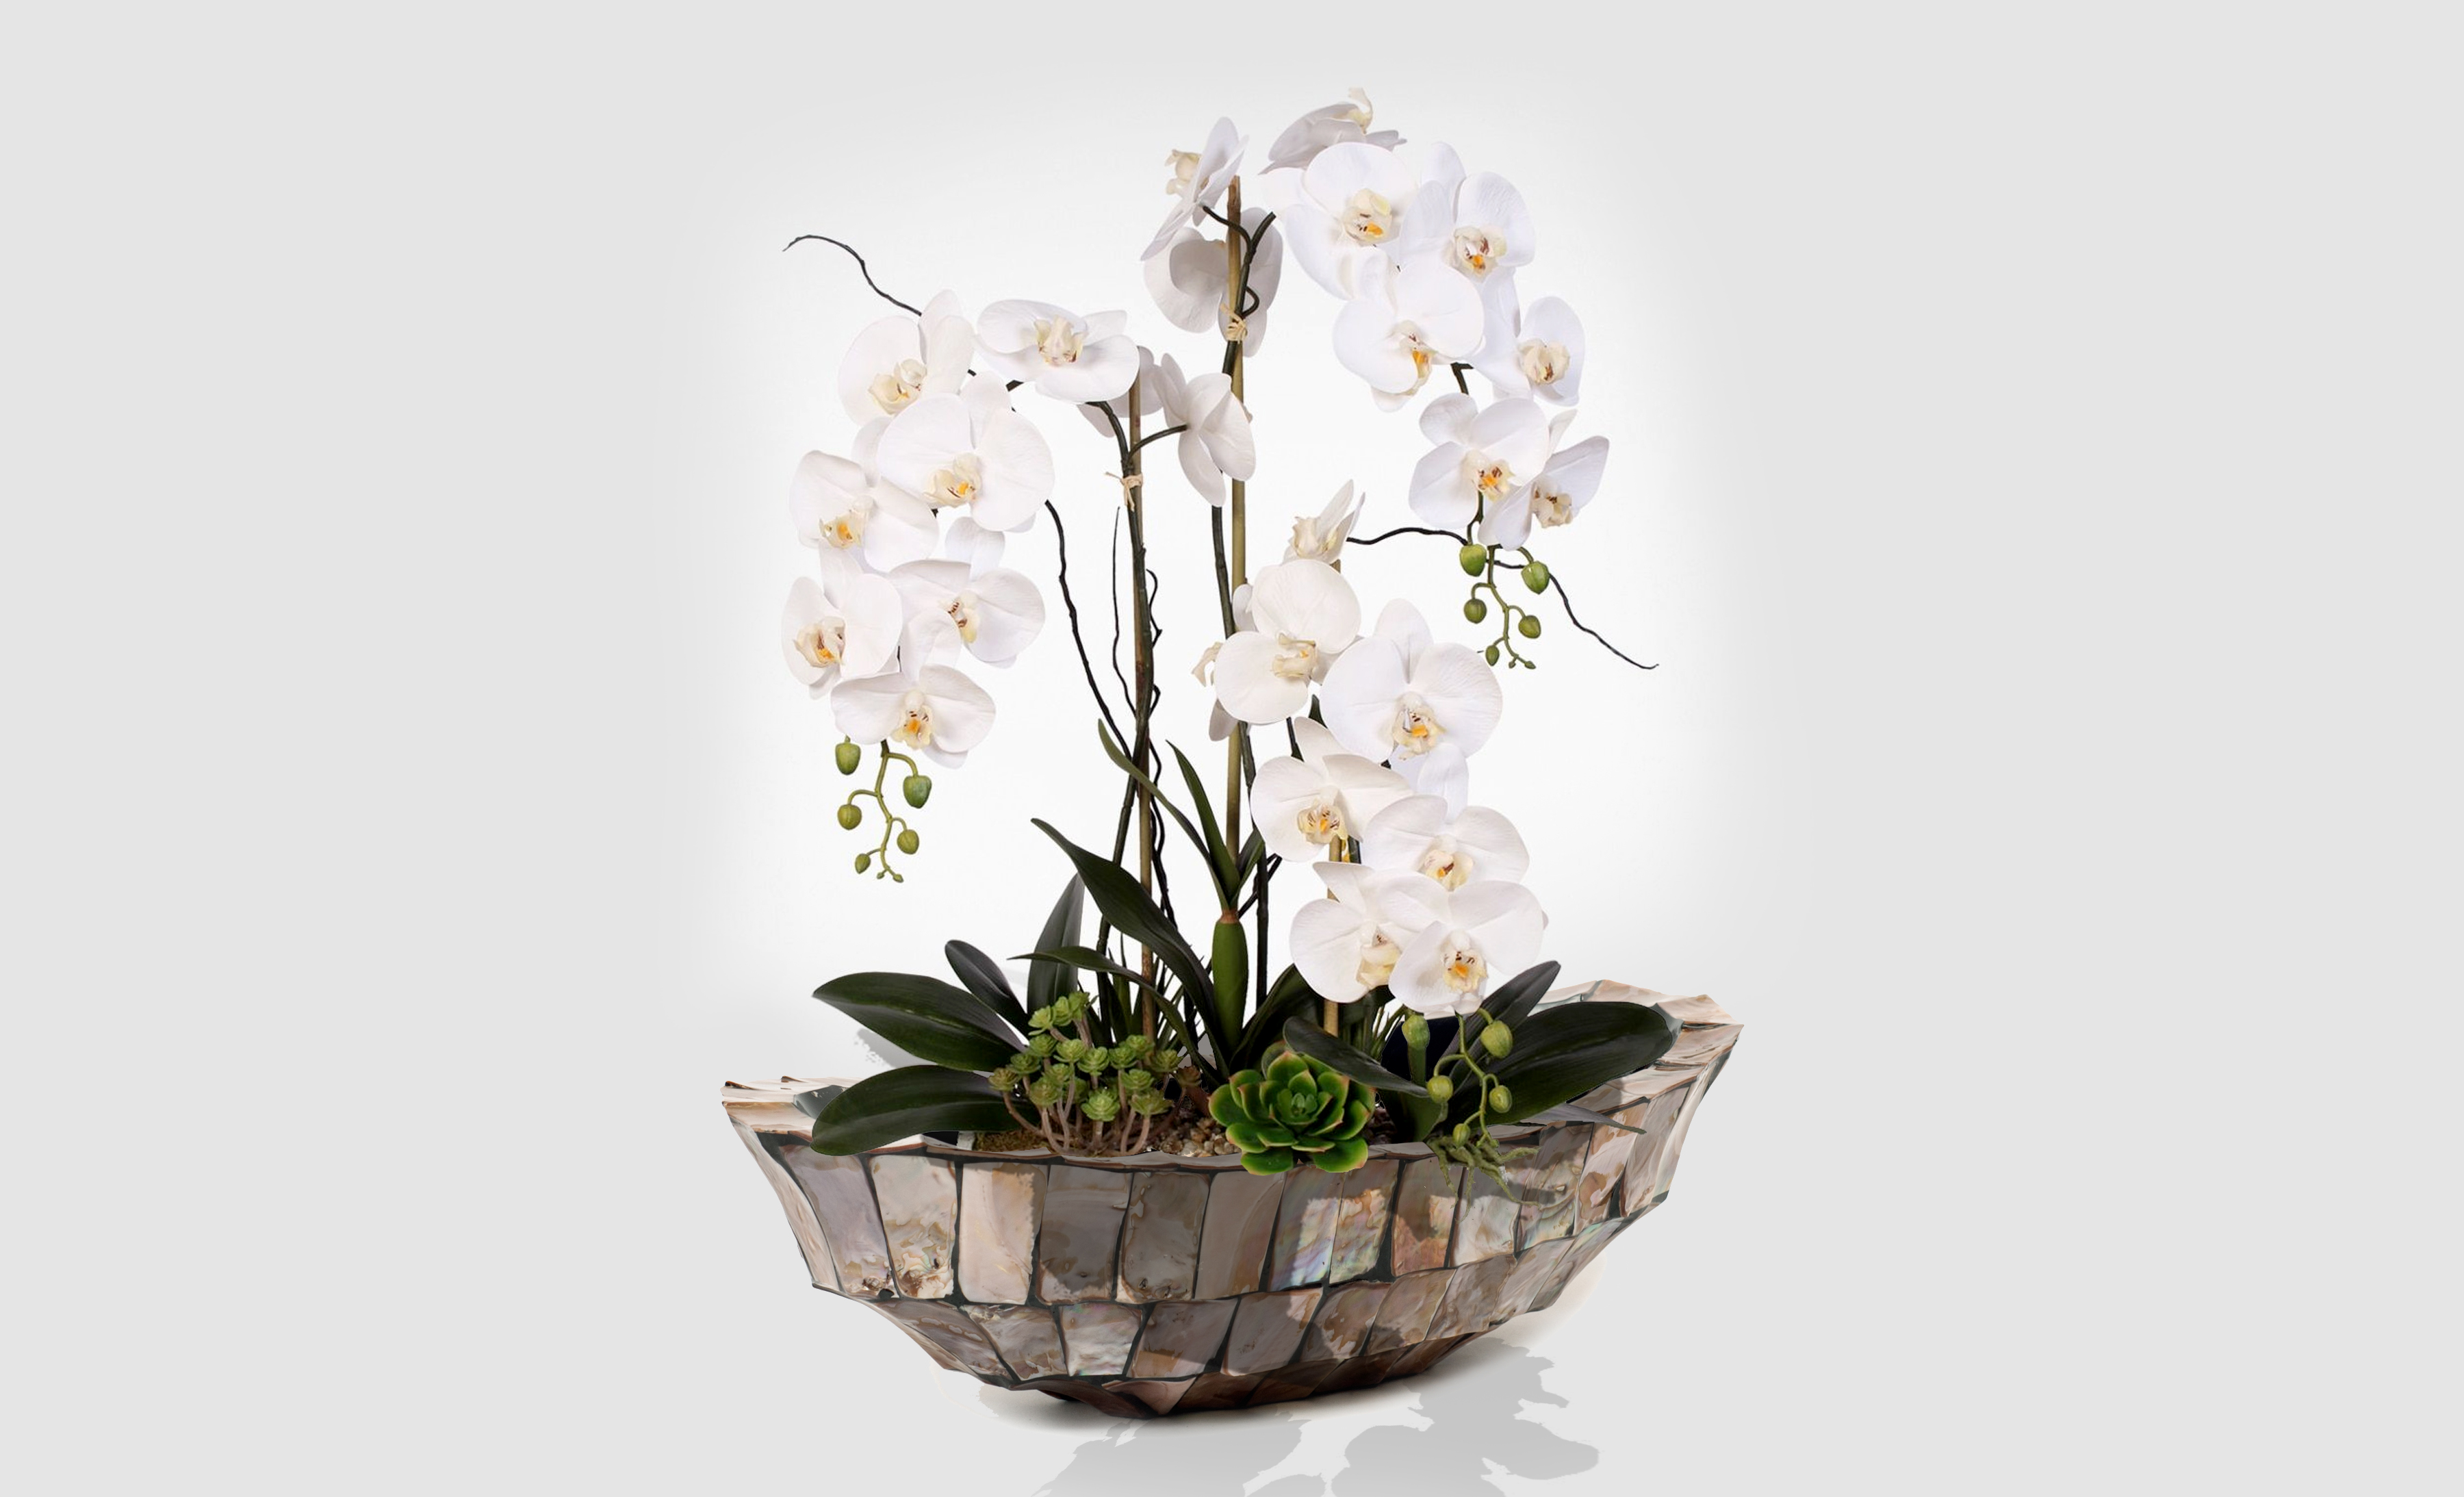 Как да отгледаме красиви орхидеи